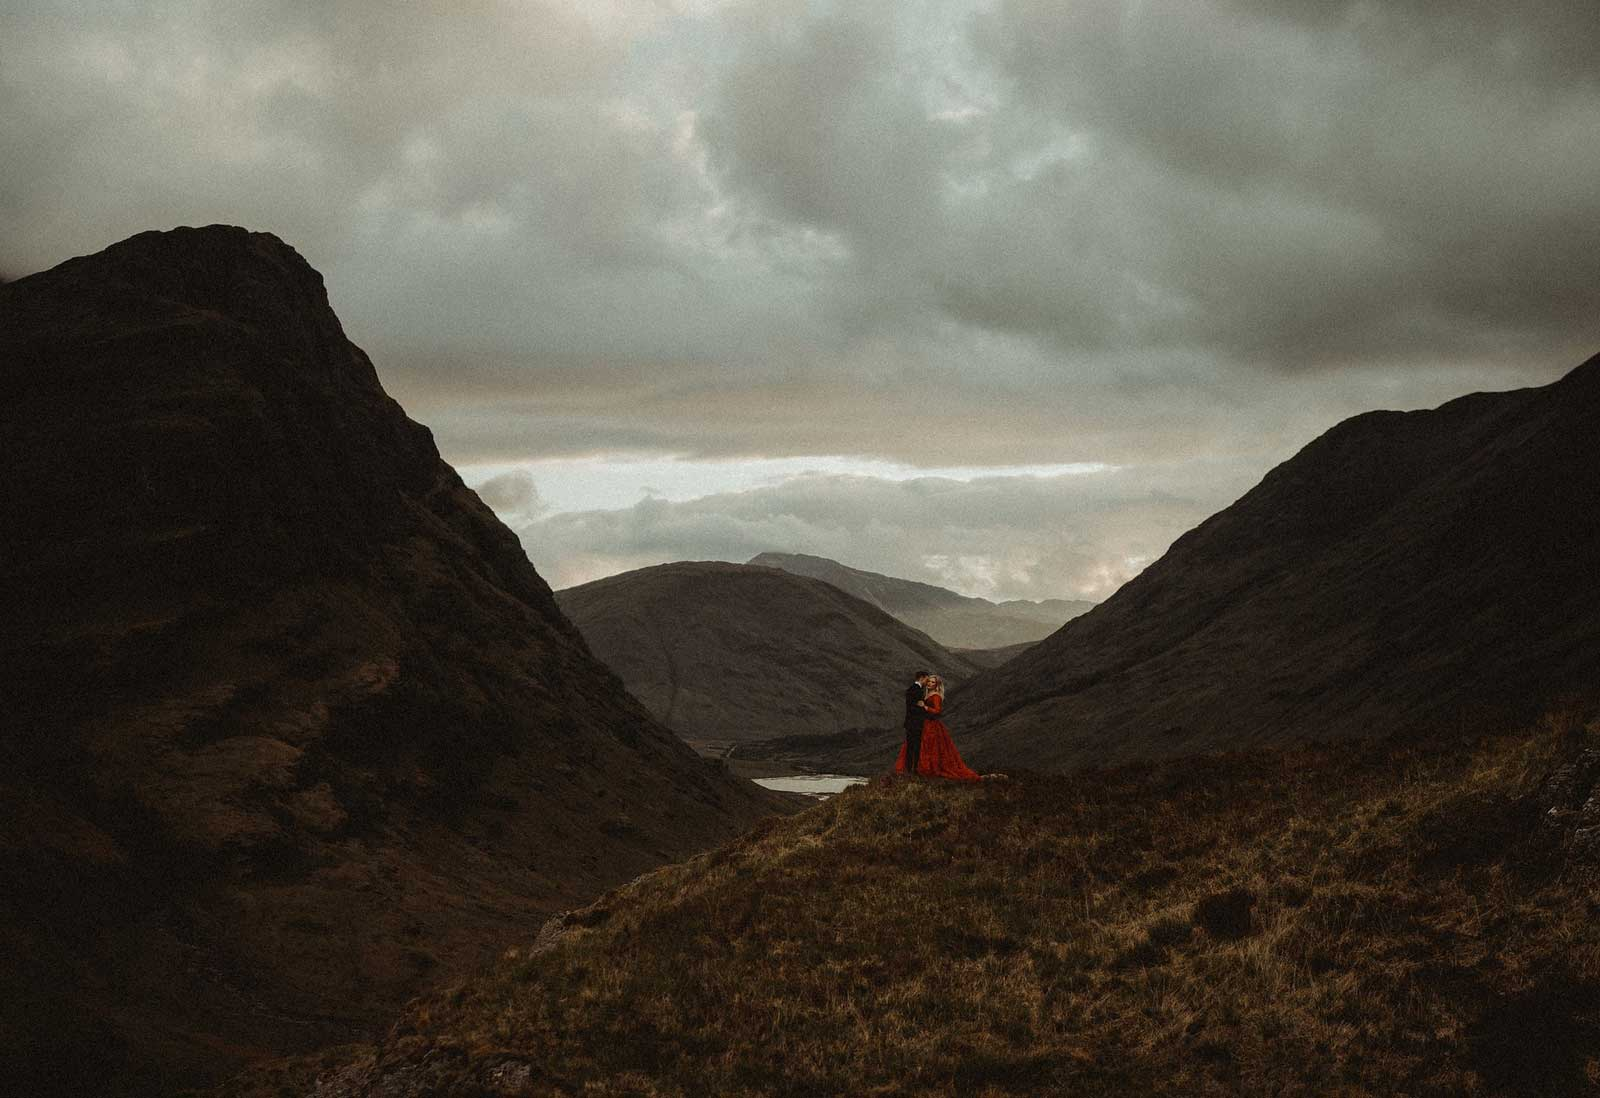 engagement photos taken within the mountains